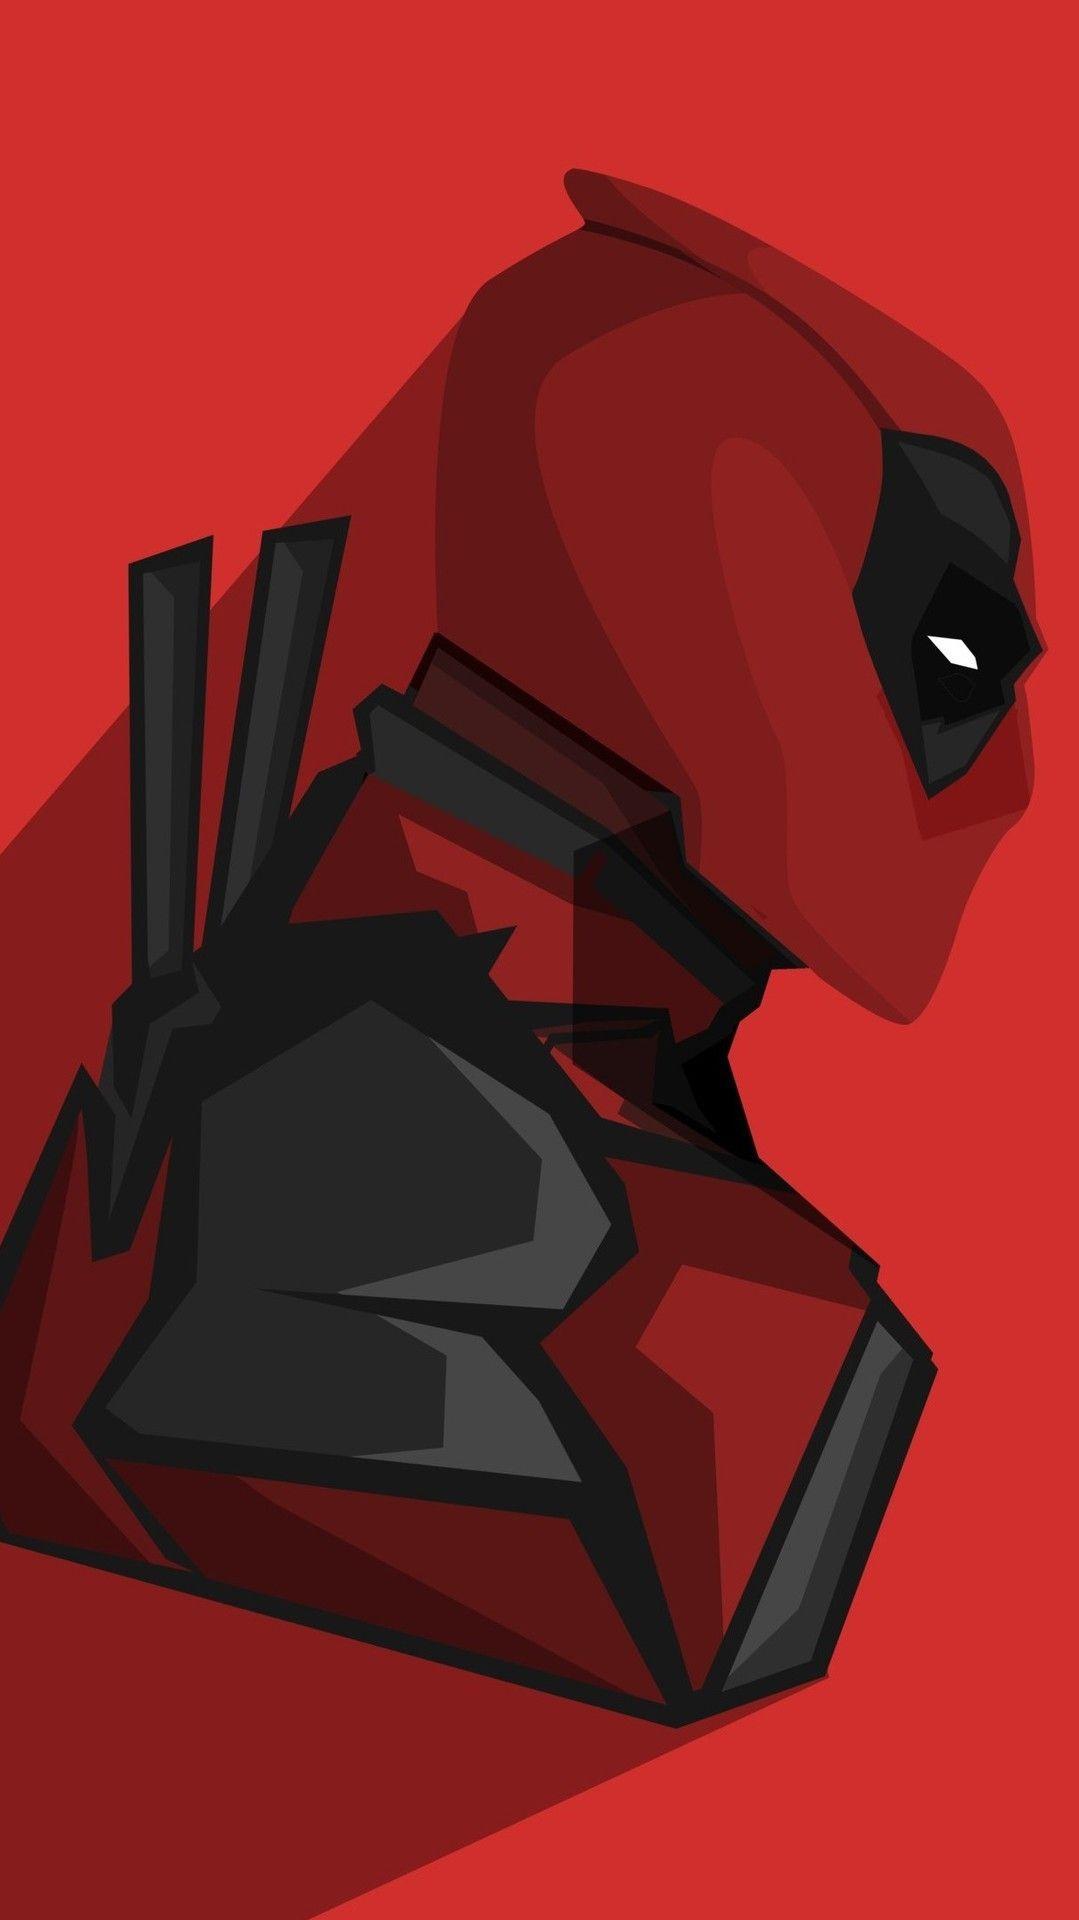 Deadpool Minimal iPhone Wallpaper